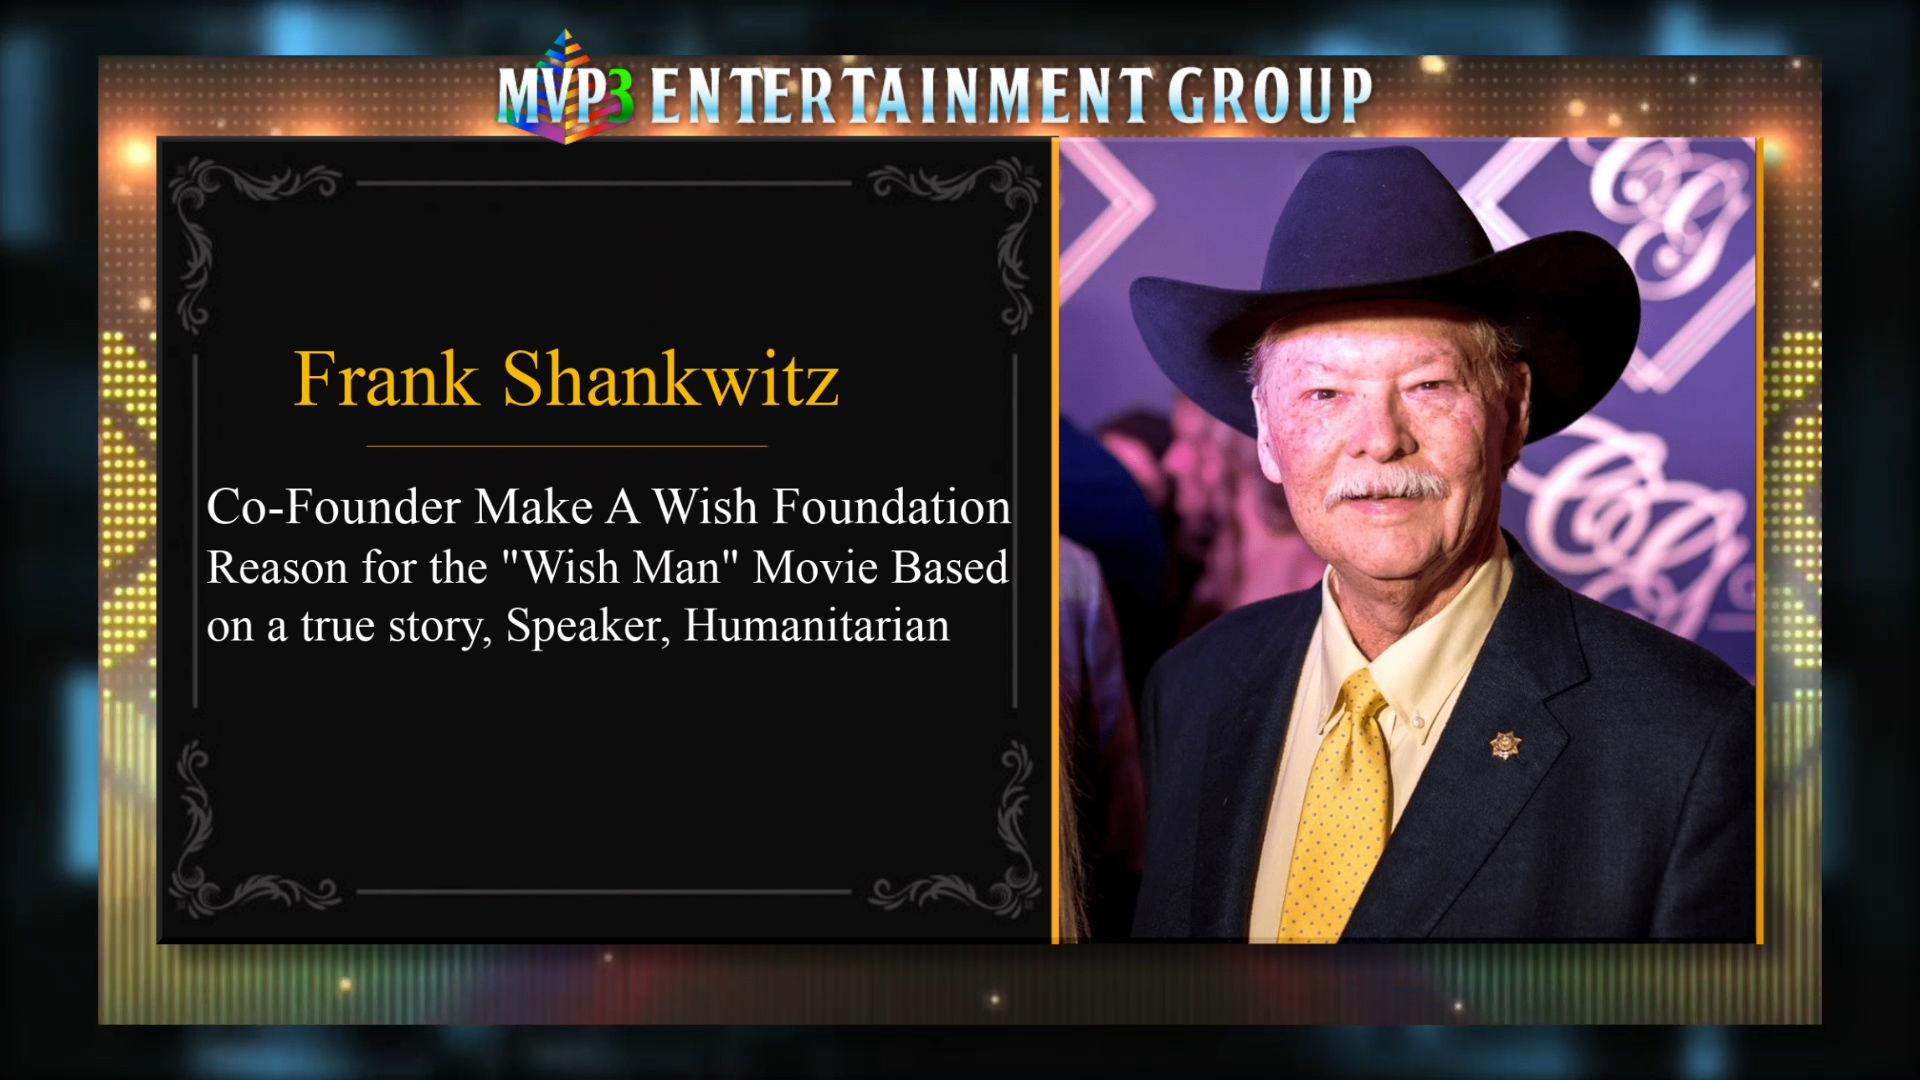 FINDING MY YES TV: Frank Shankwitz aka WISH MAN